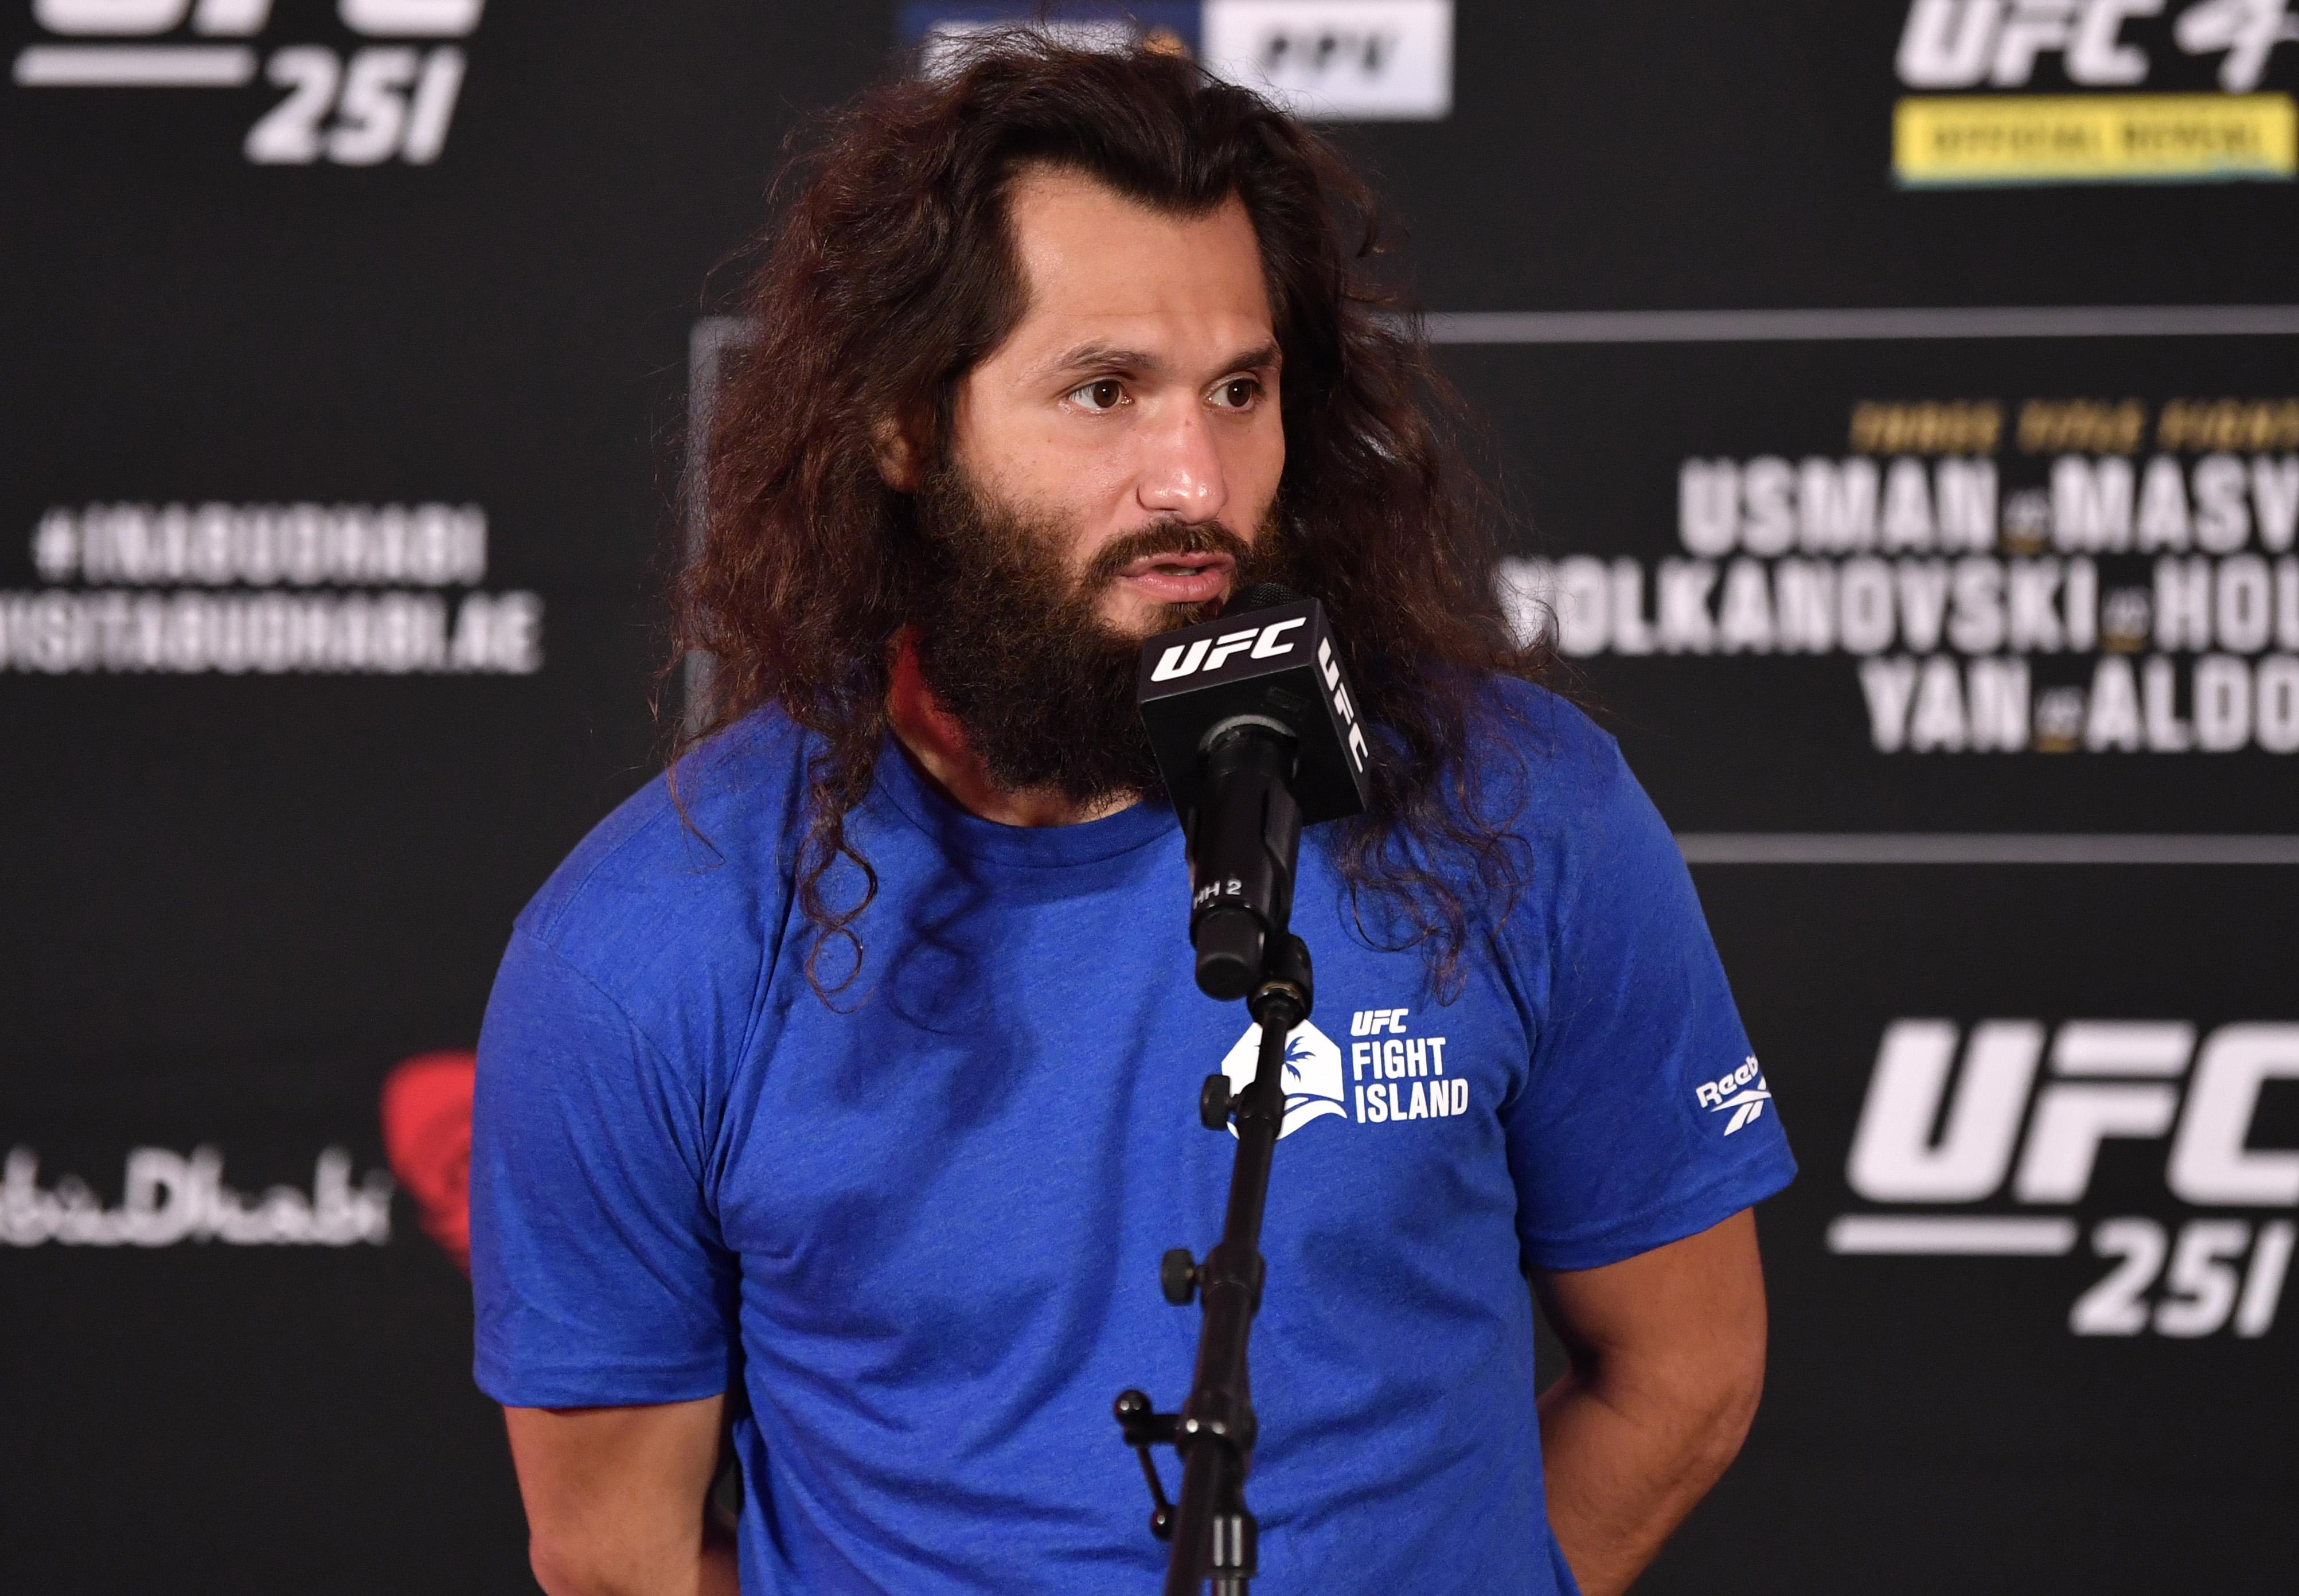 UFC 251 Usman v Masvidal: Weigh-Ins